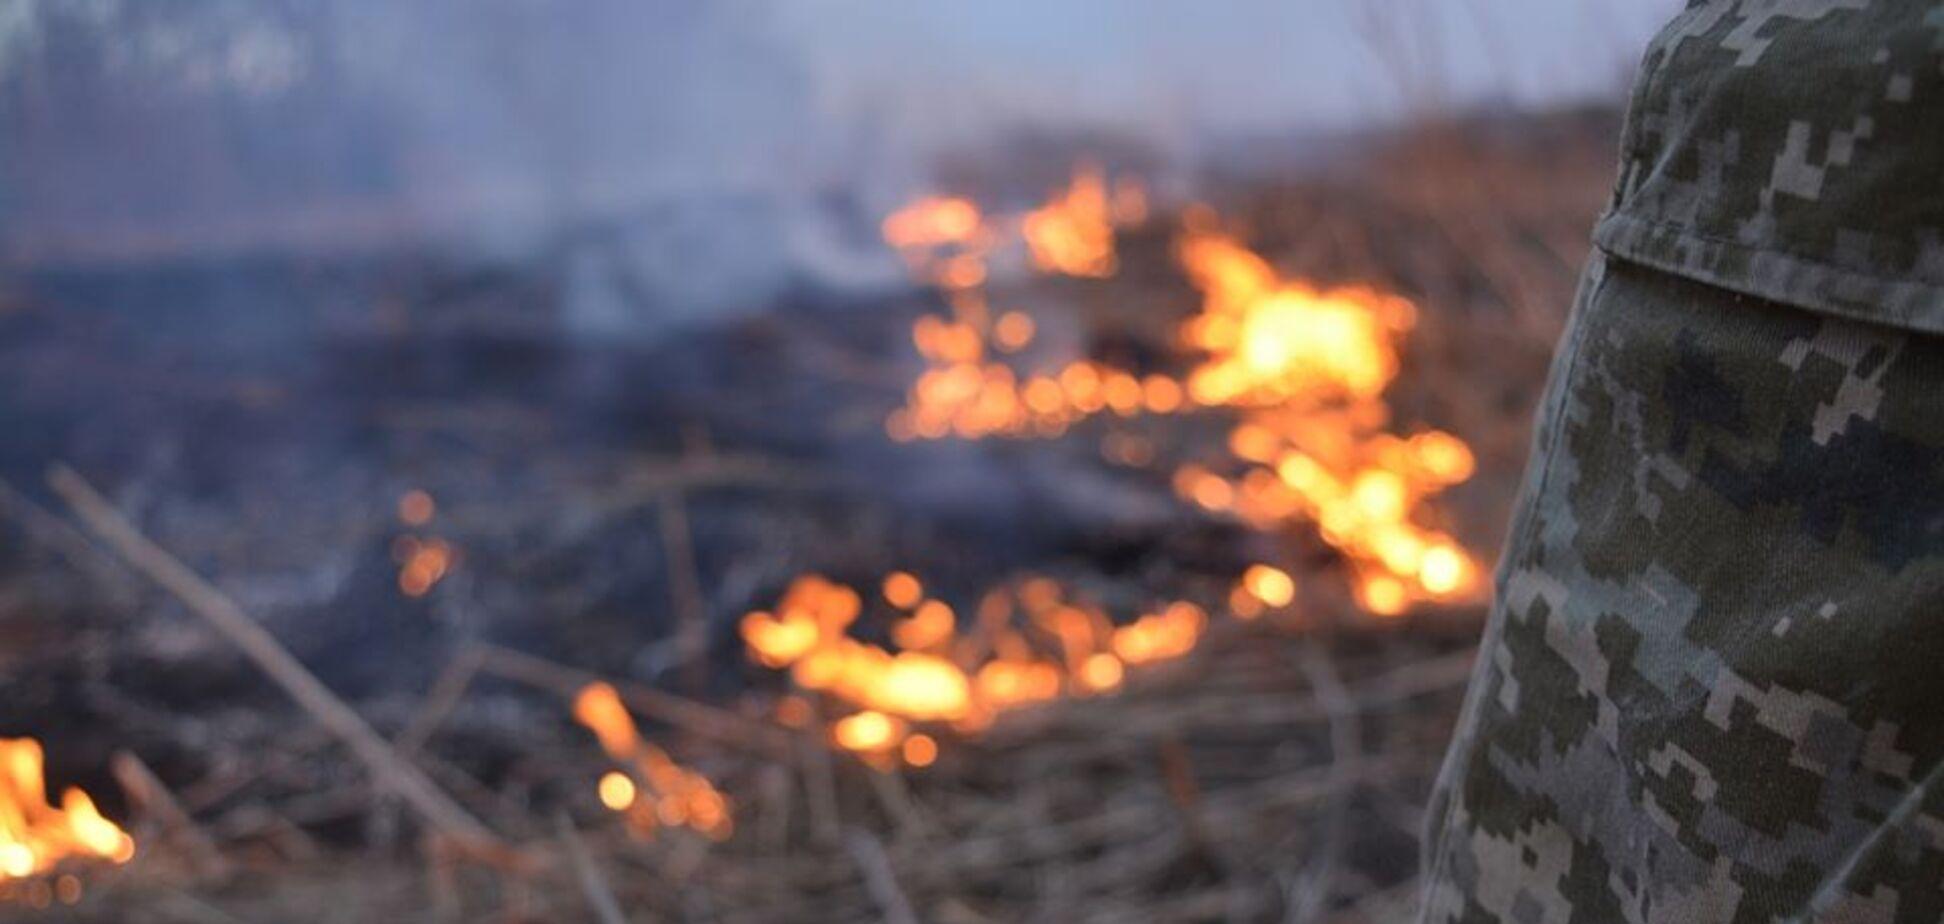 Найманці Путіна напали на ЗСУ і влаштували масштабну пожежу на Донбасі